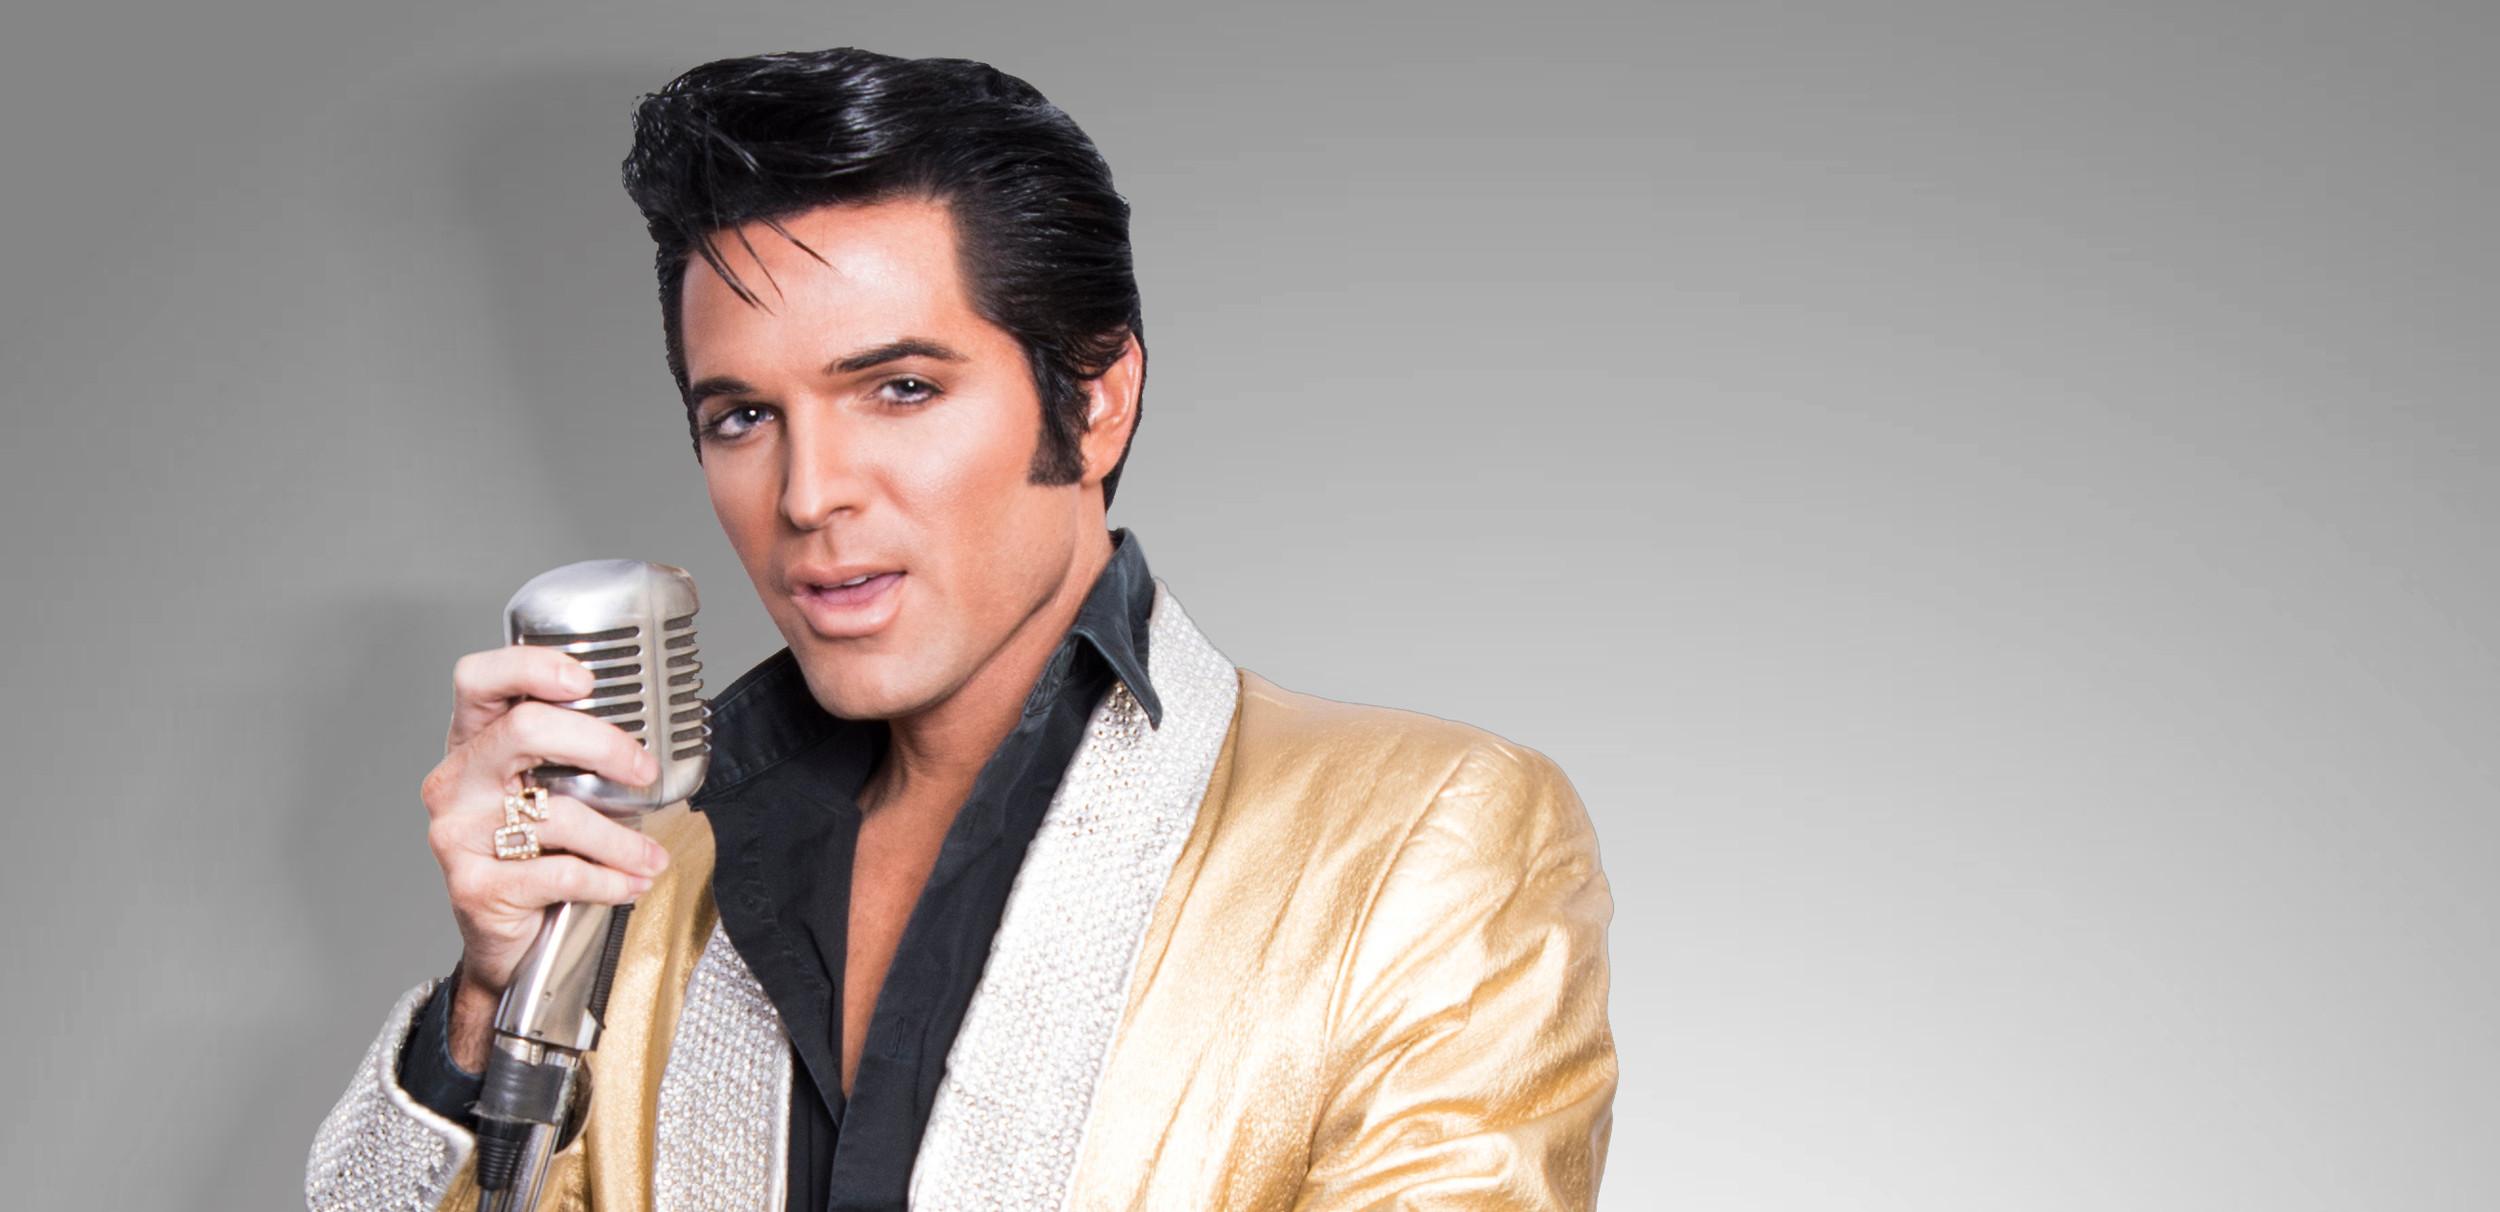 BIO | Dean Z Dot Com Ultimate Elvis Tribute Artist Champion